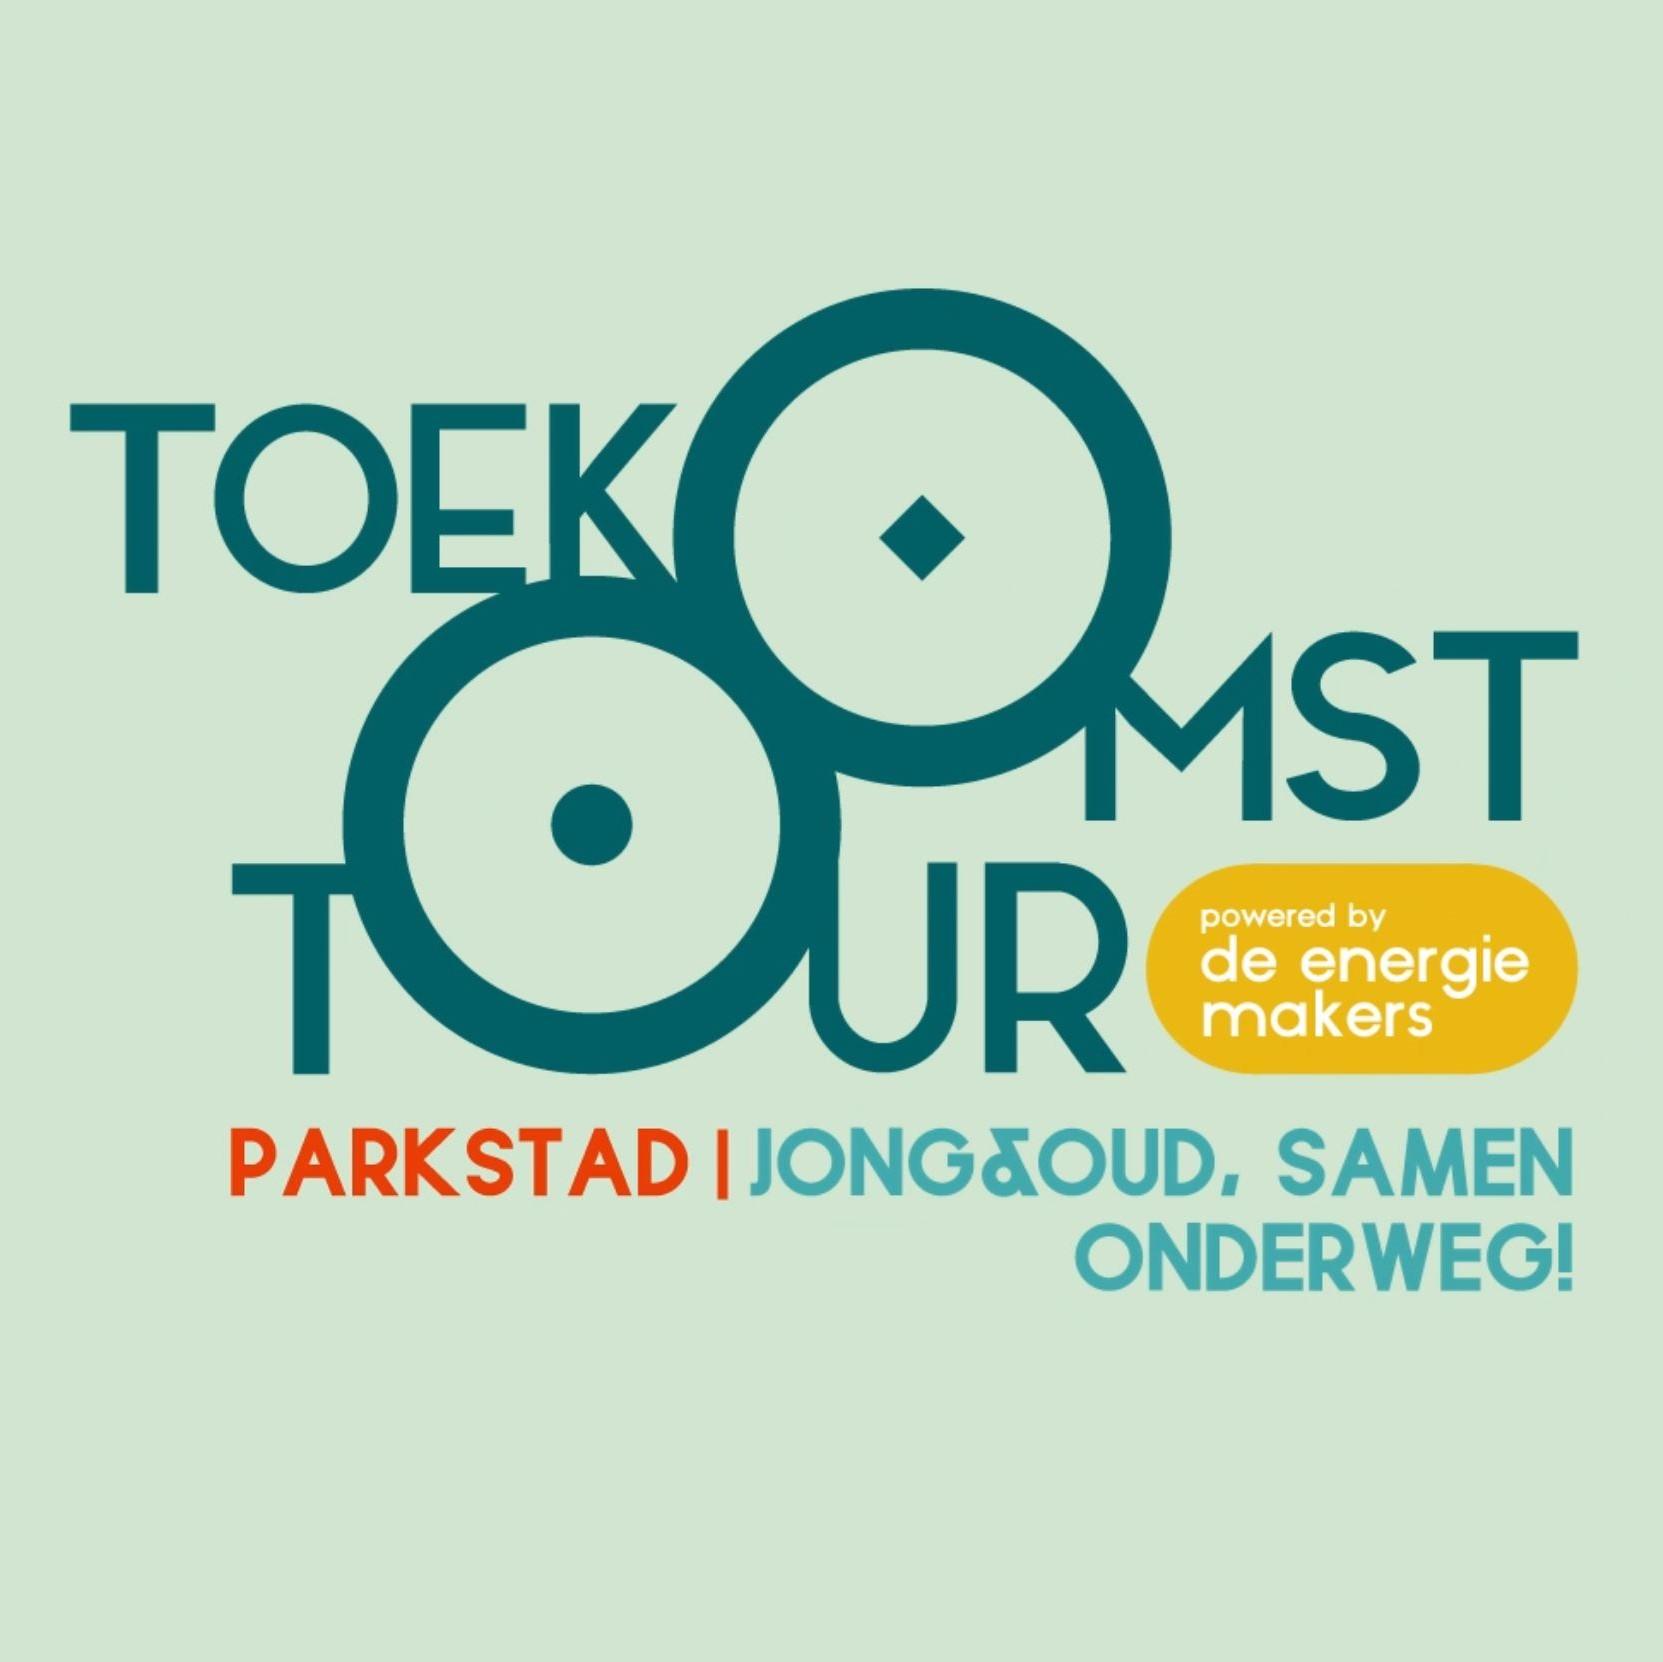 Toekomst Tour